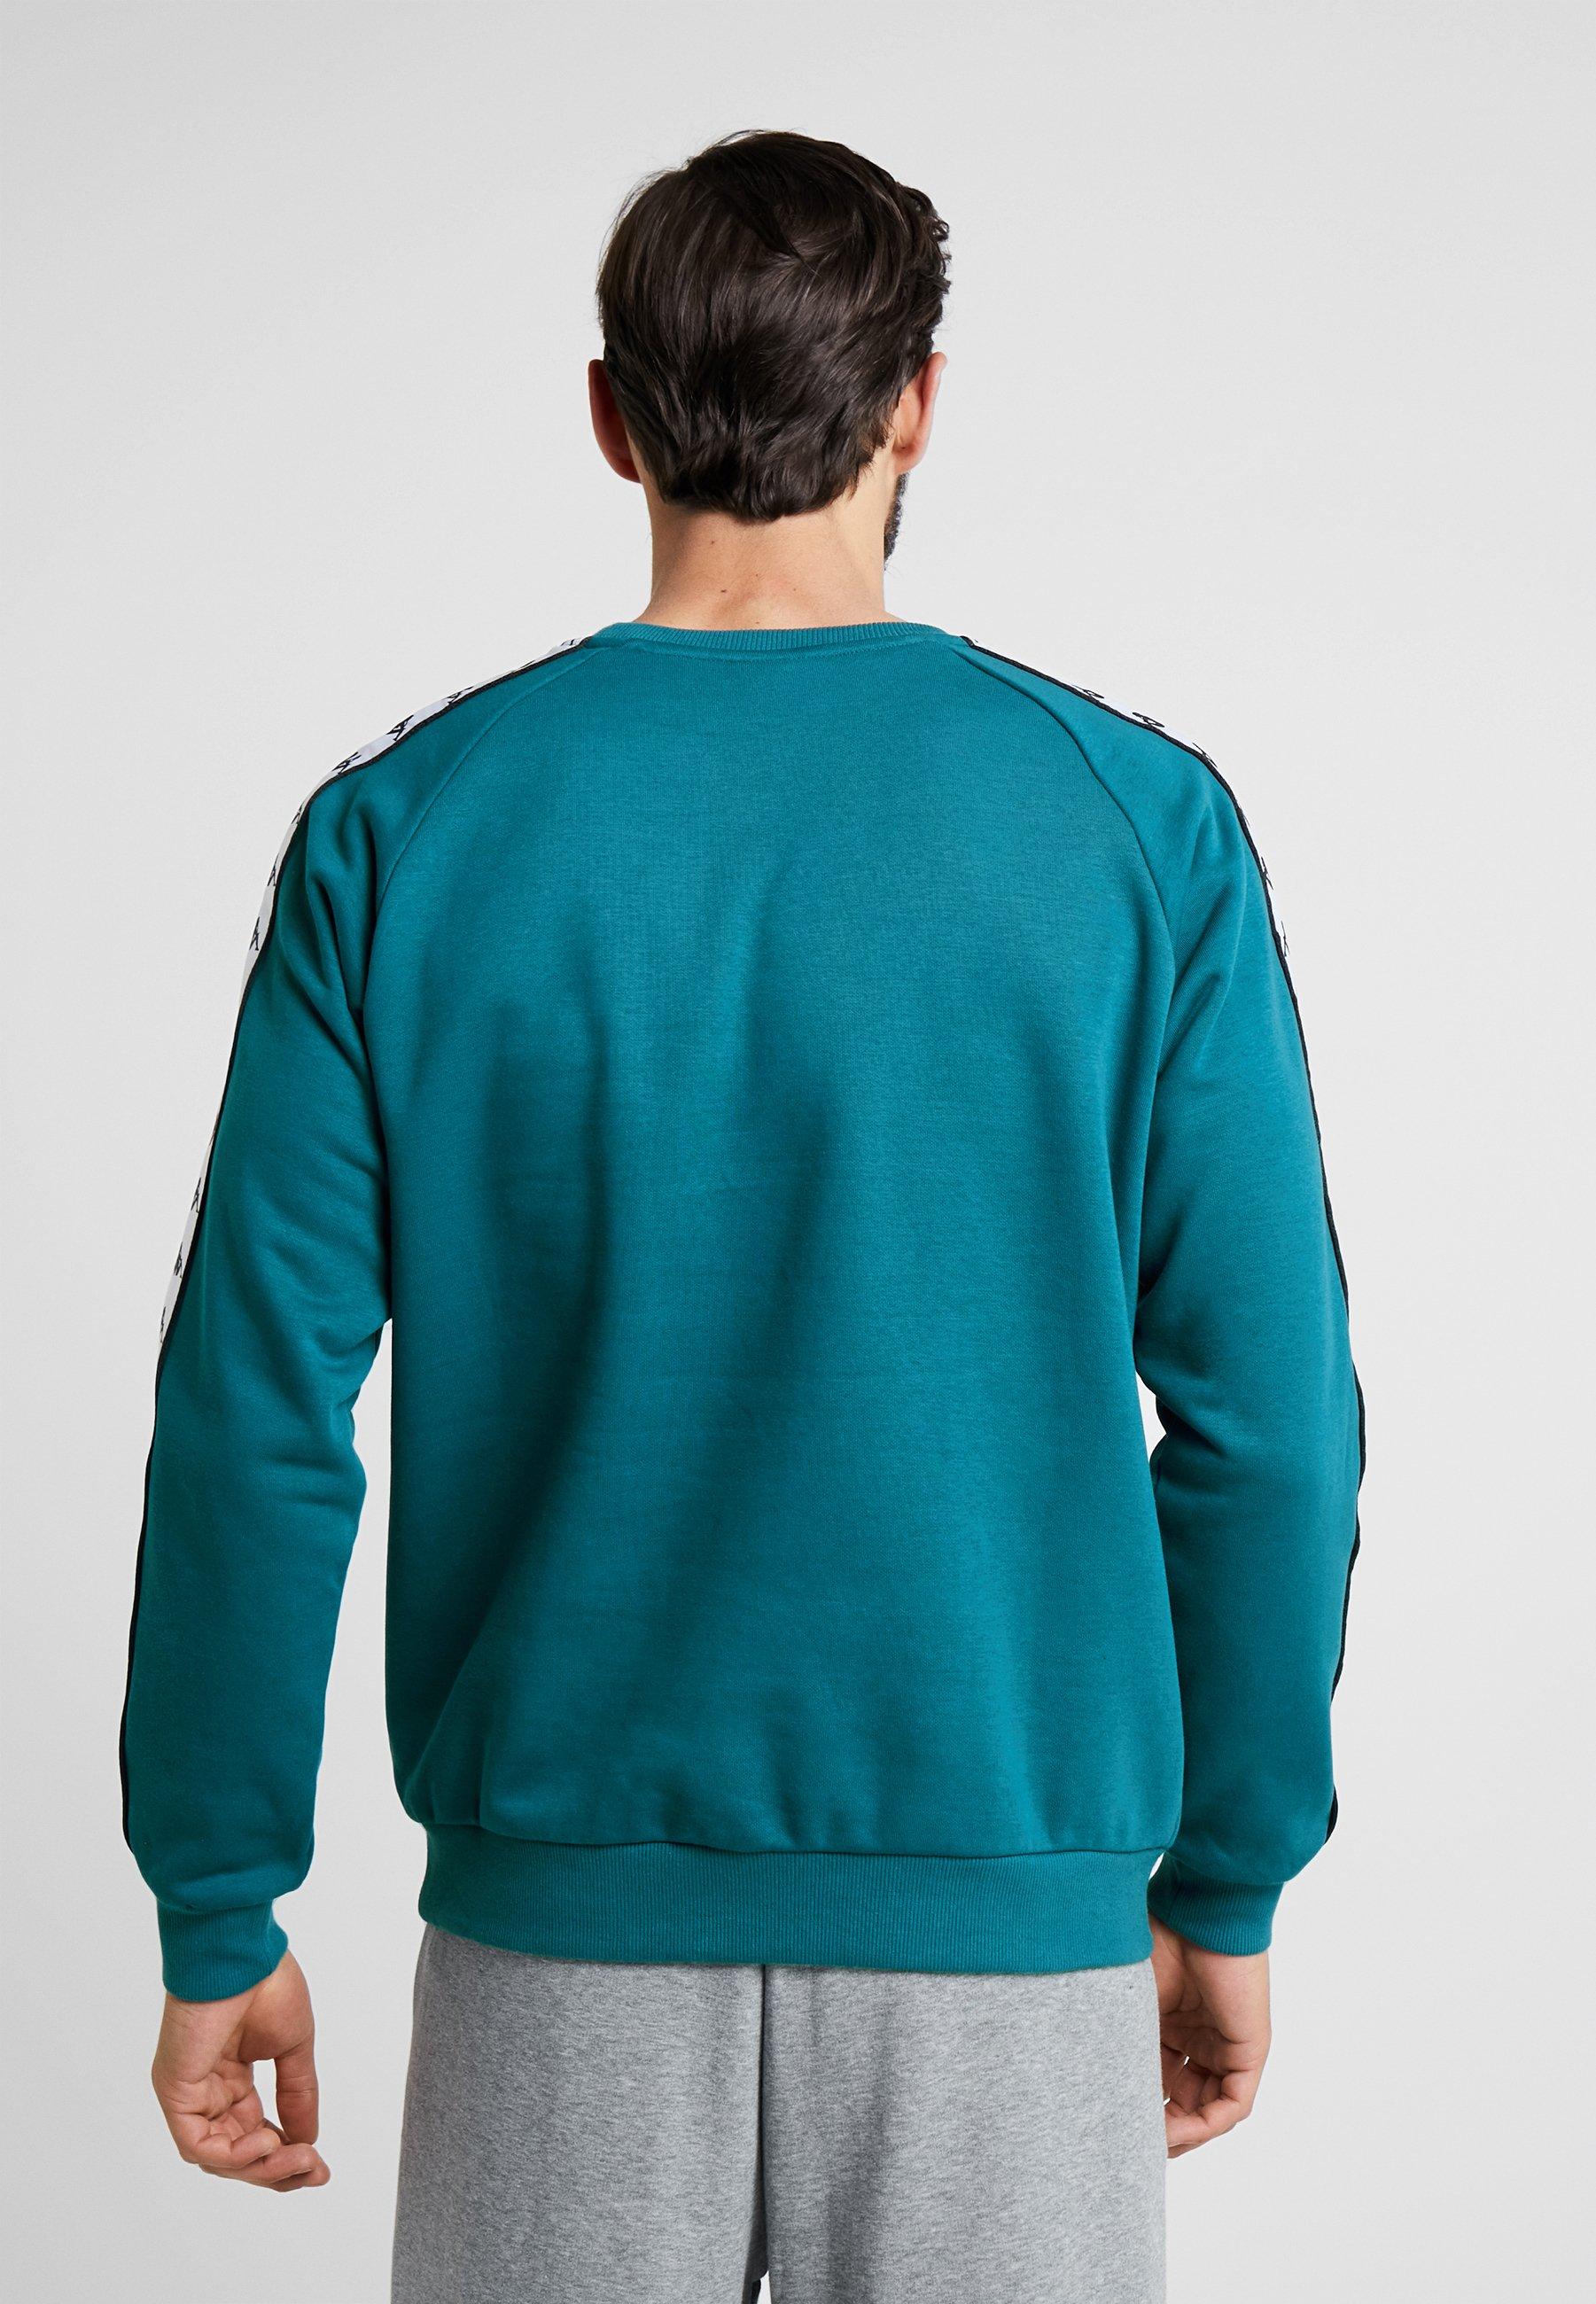 FaddeiSweatshirt Coral Kappa FaddeiSweatshirt Kappa Coral Kappa Blue Blue vyYfIgmb76